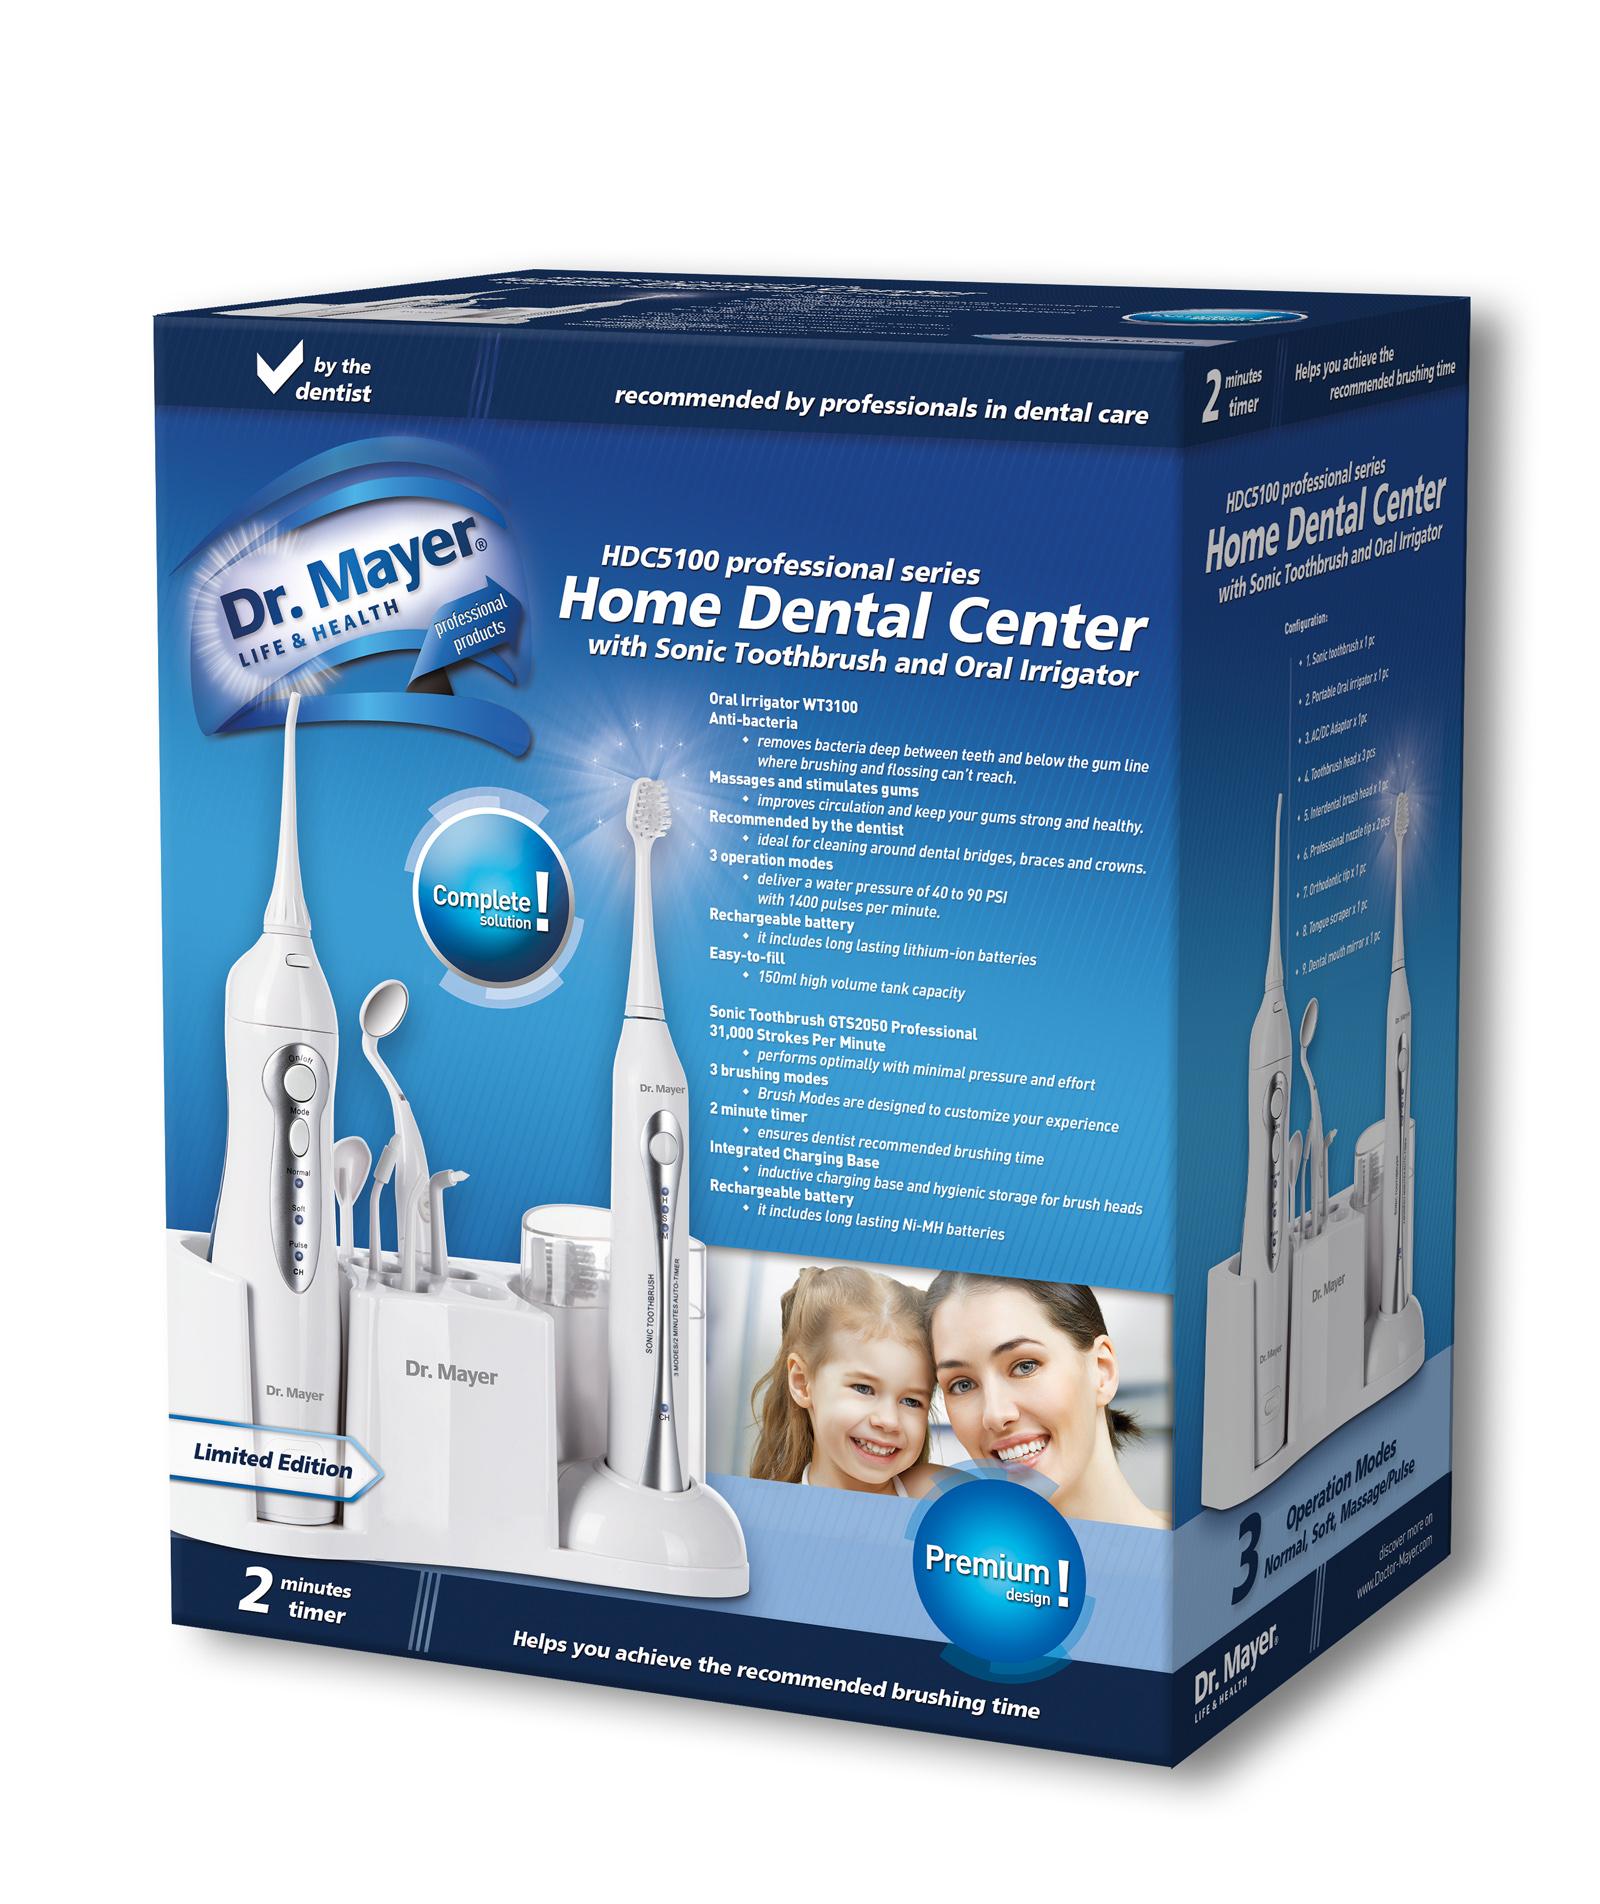 Home Dental Center HDC5100